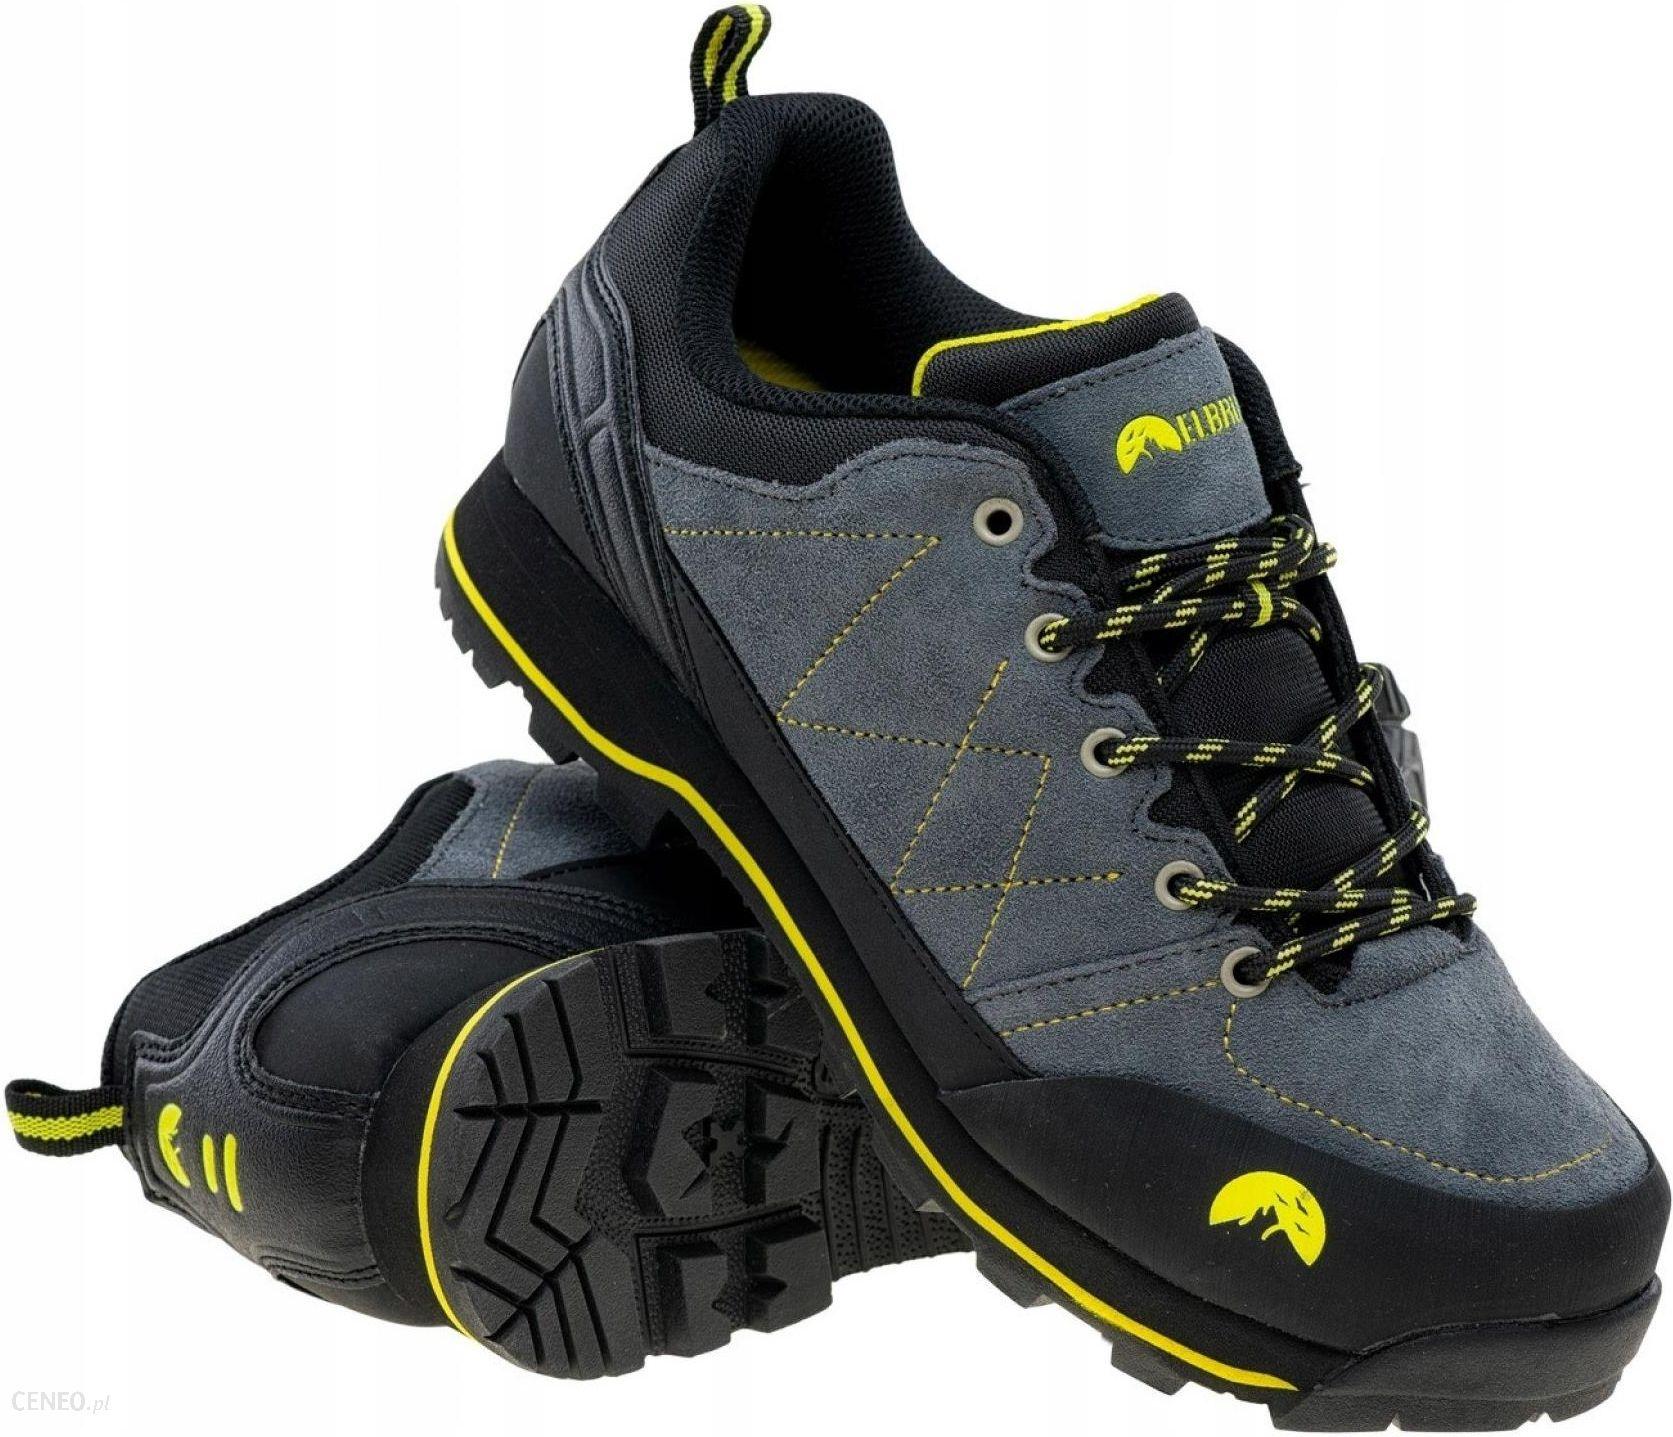 Buty Trekkingowe Elbrus Tilbur Steel Grey Black Lime 4665 Ceny I Opinie Ceneo Pl